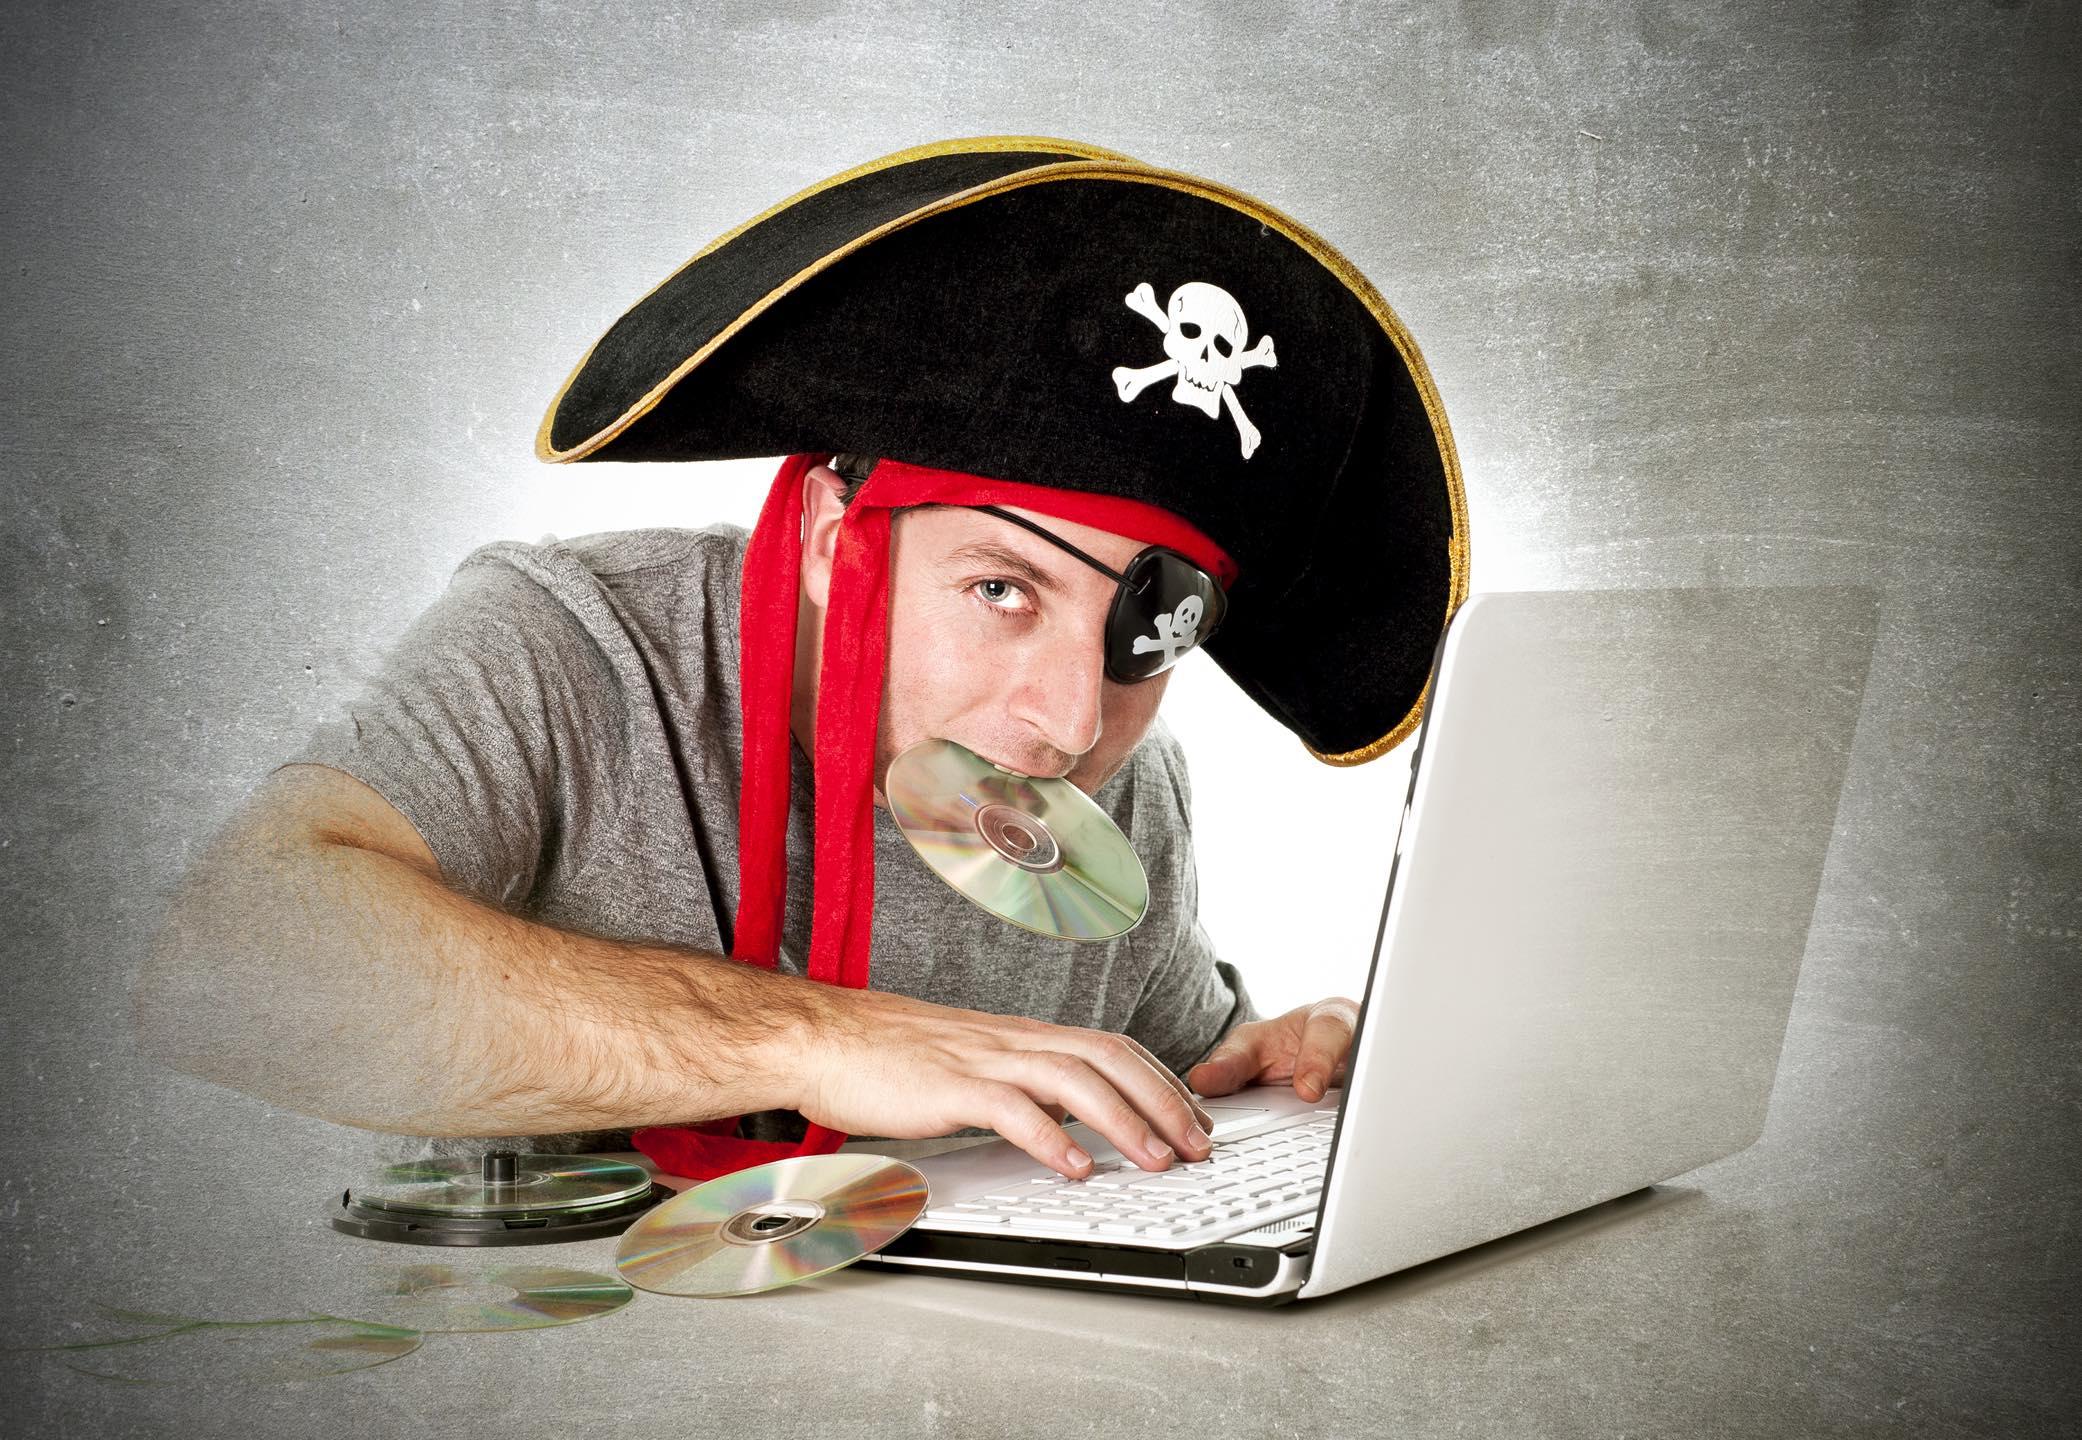 Music labels sue Charter, complain that high Internet speeds fuel piracy | Ars Technica